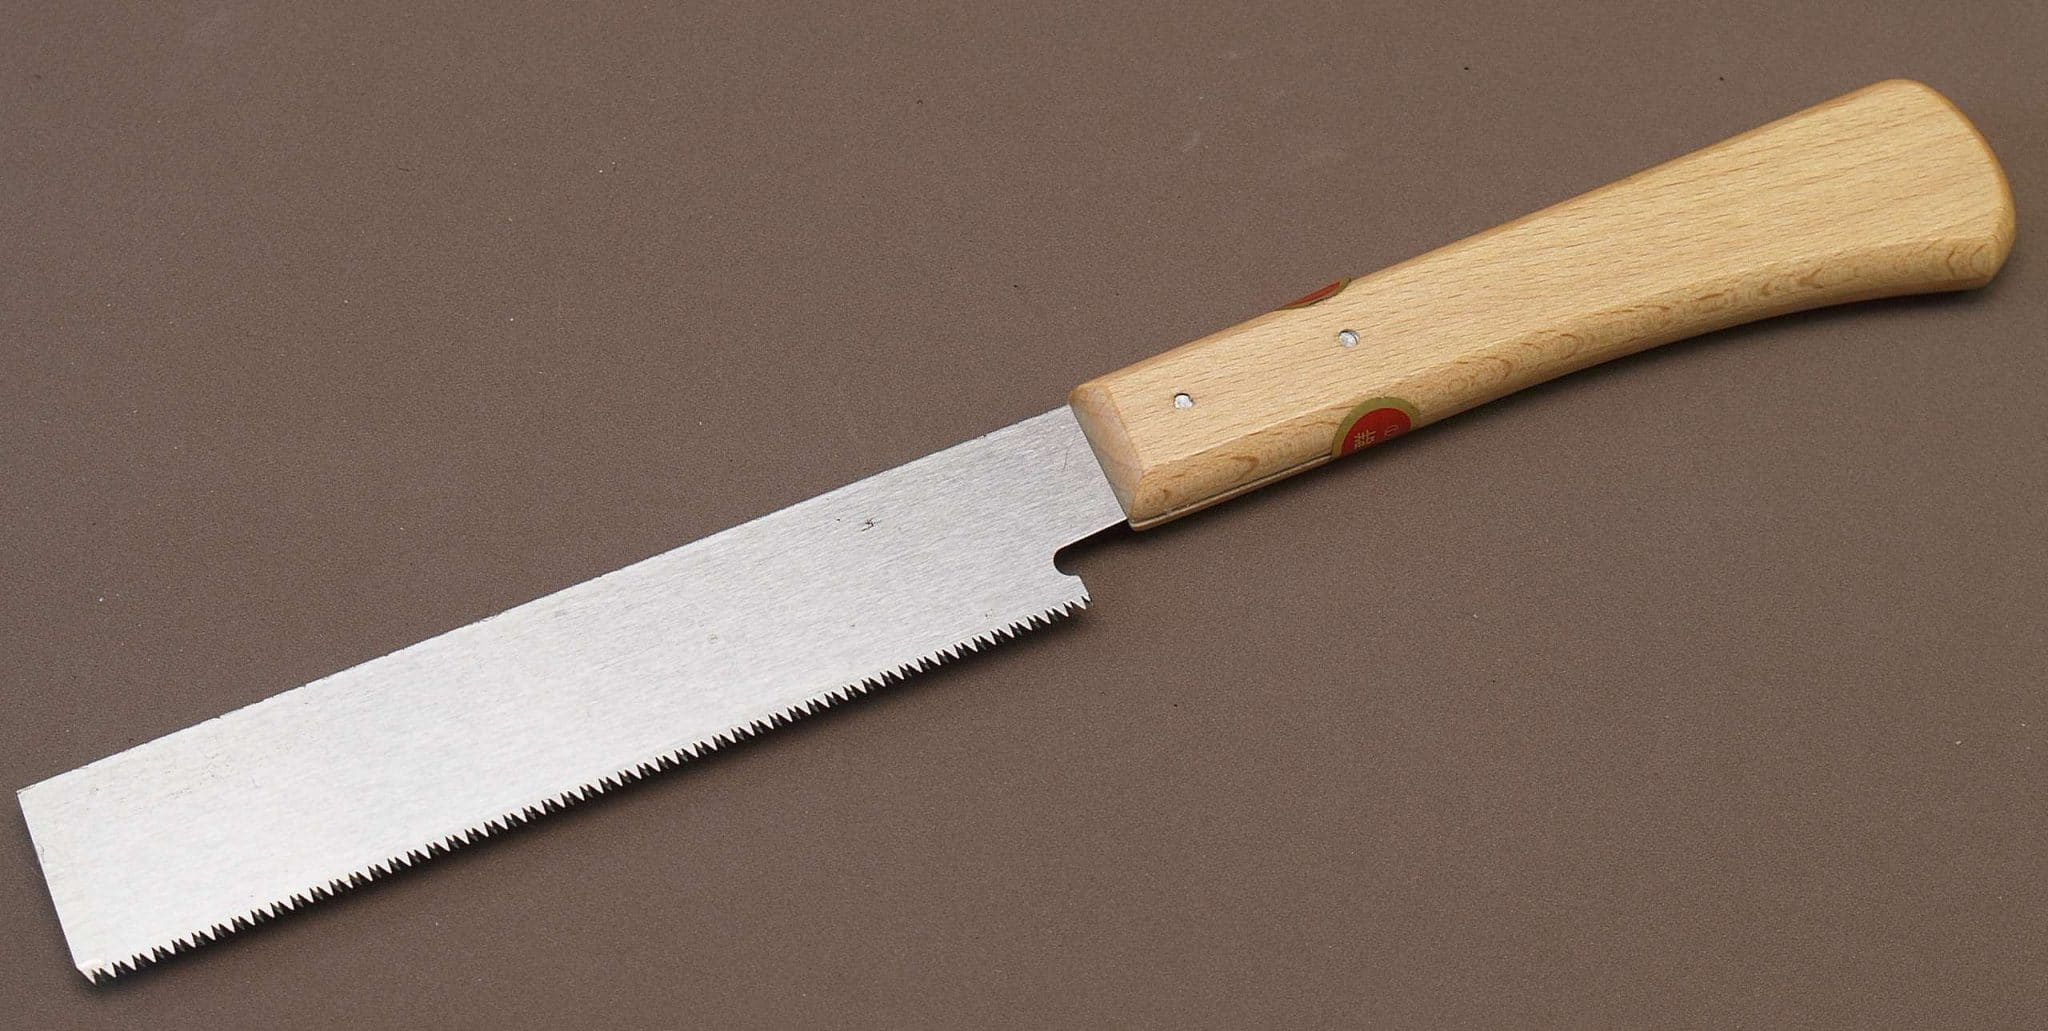 masahiro usuba, masahiro cutlery